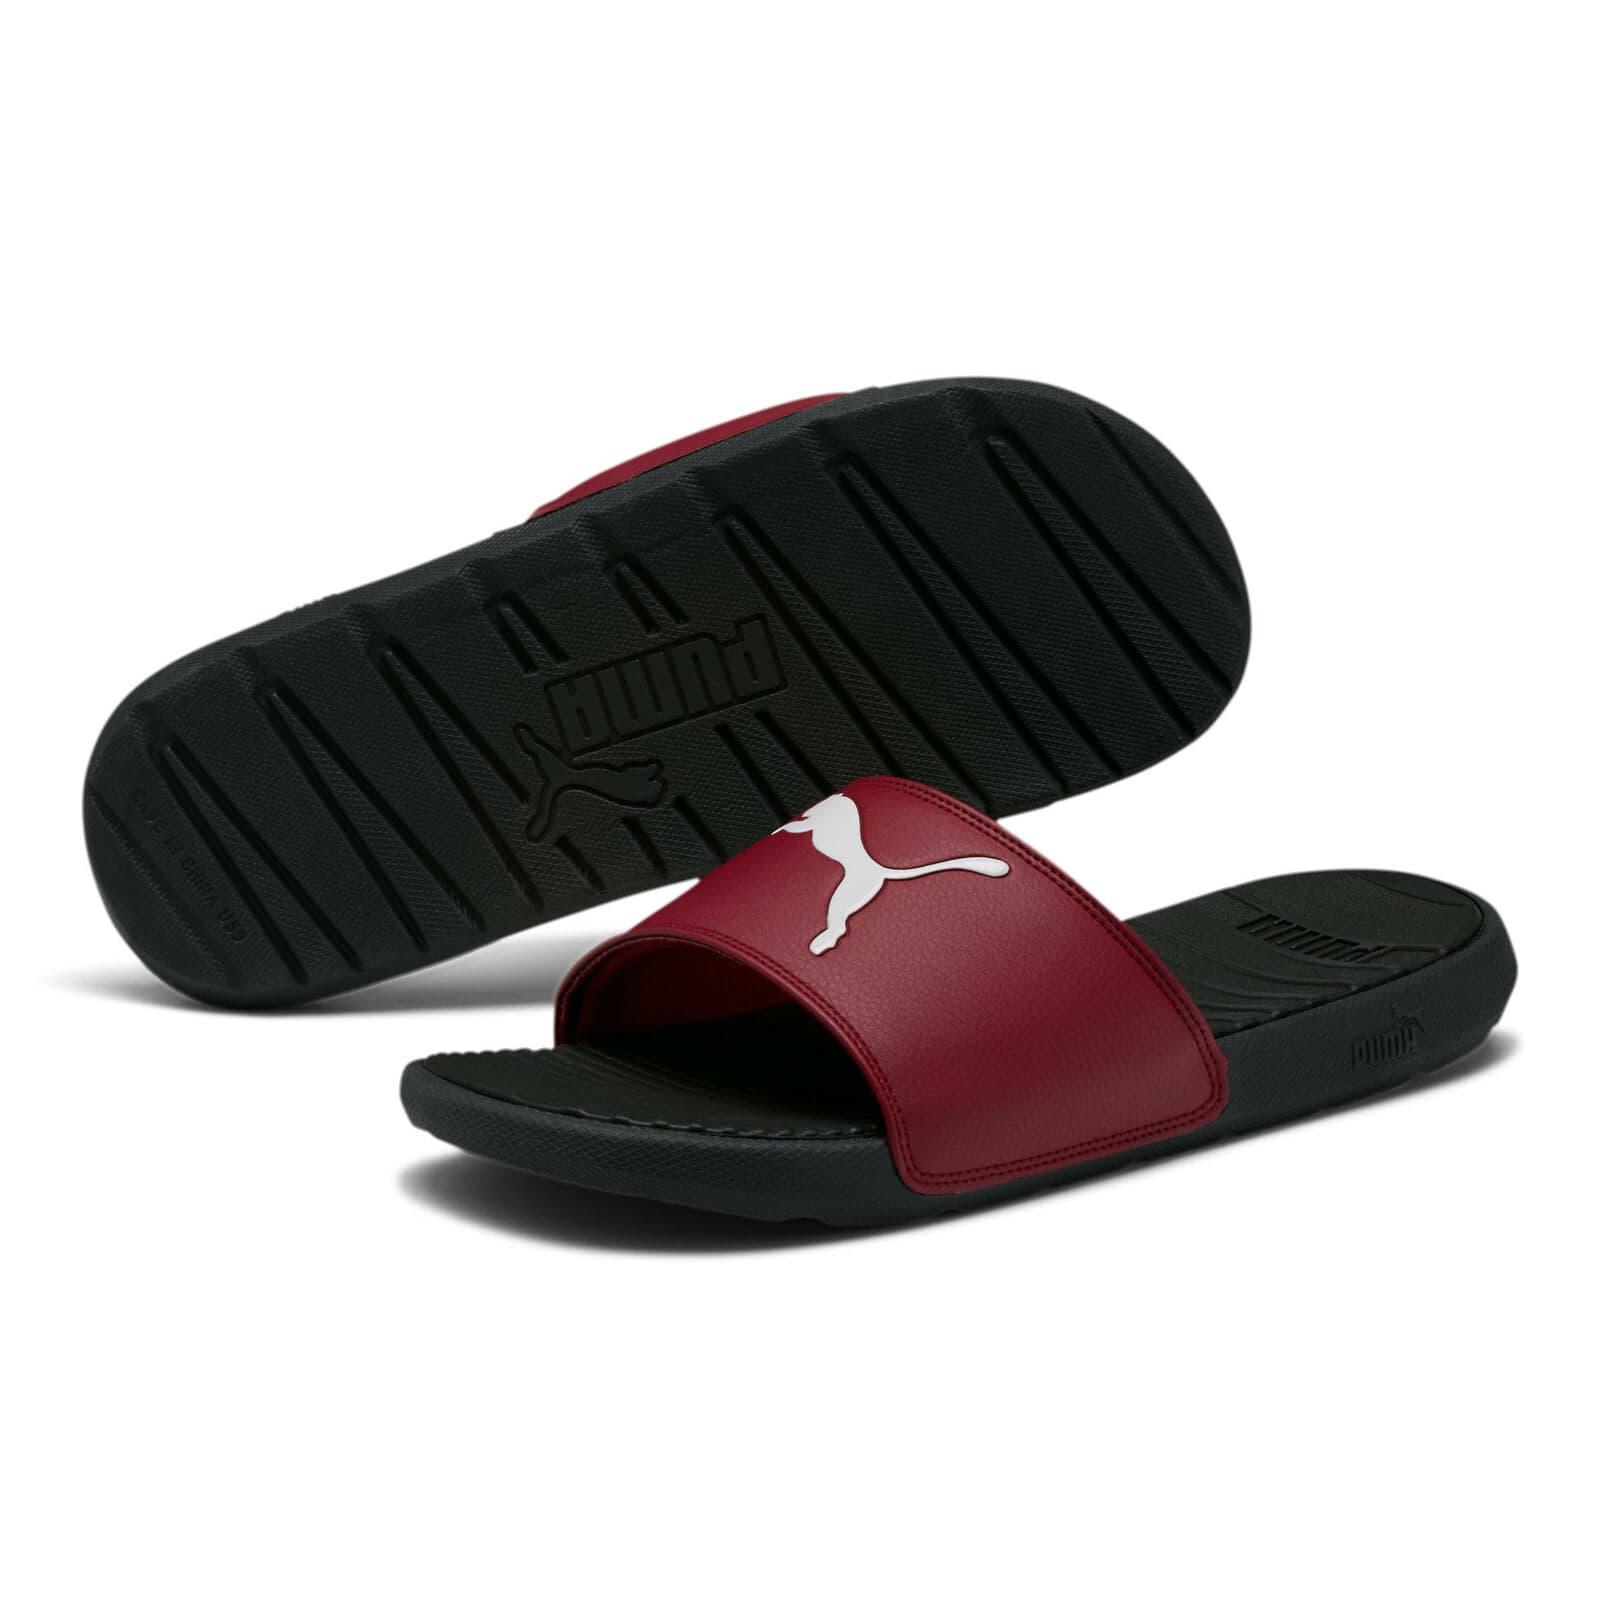 PUMA Men's Cool Cat Sport Slides Sandal (Black/Rhubarb)